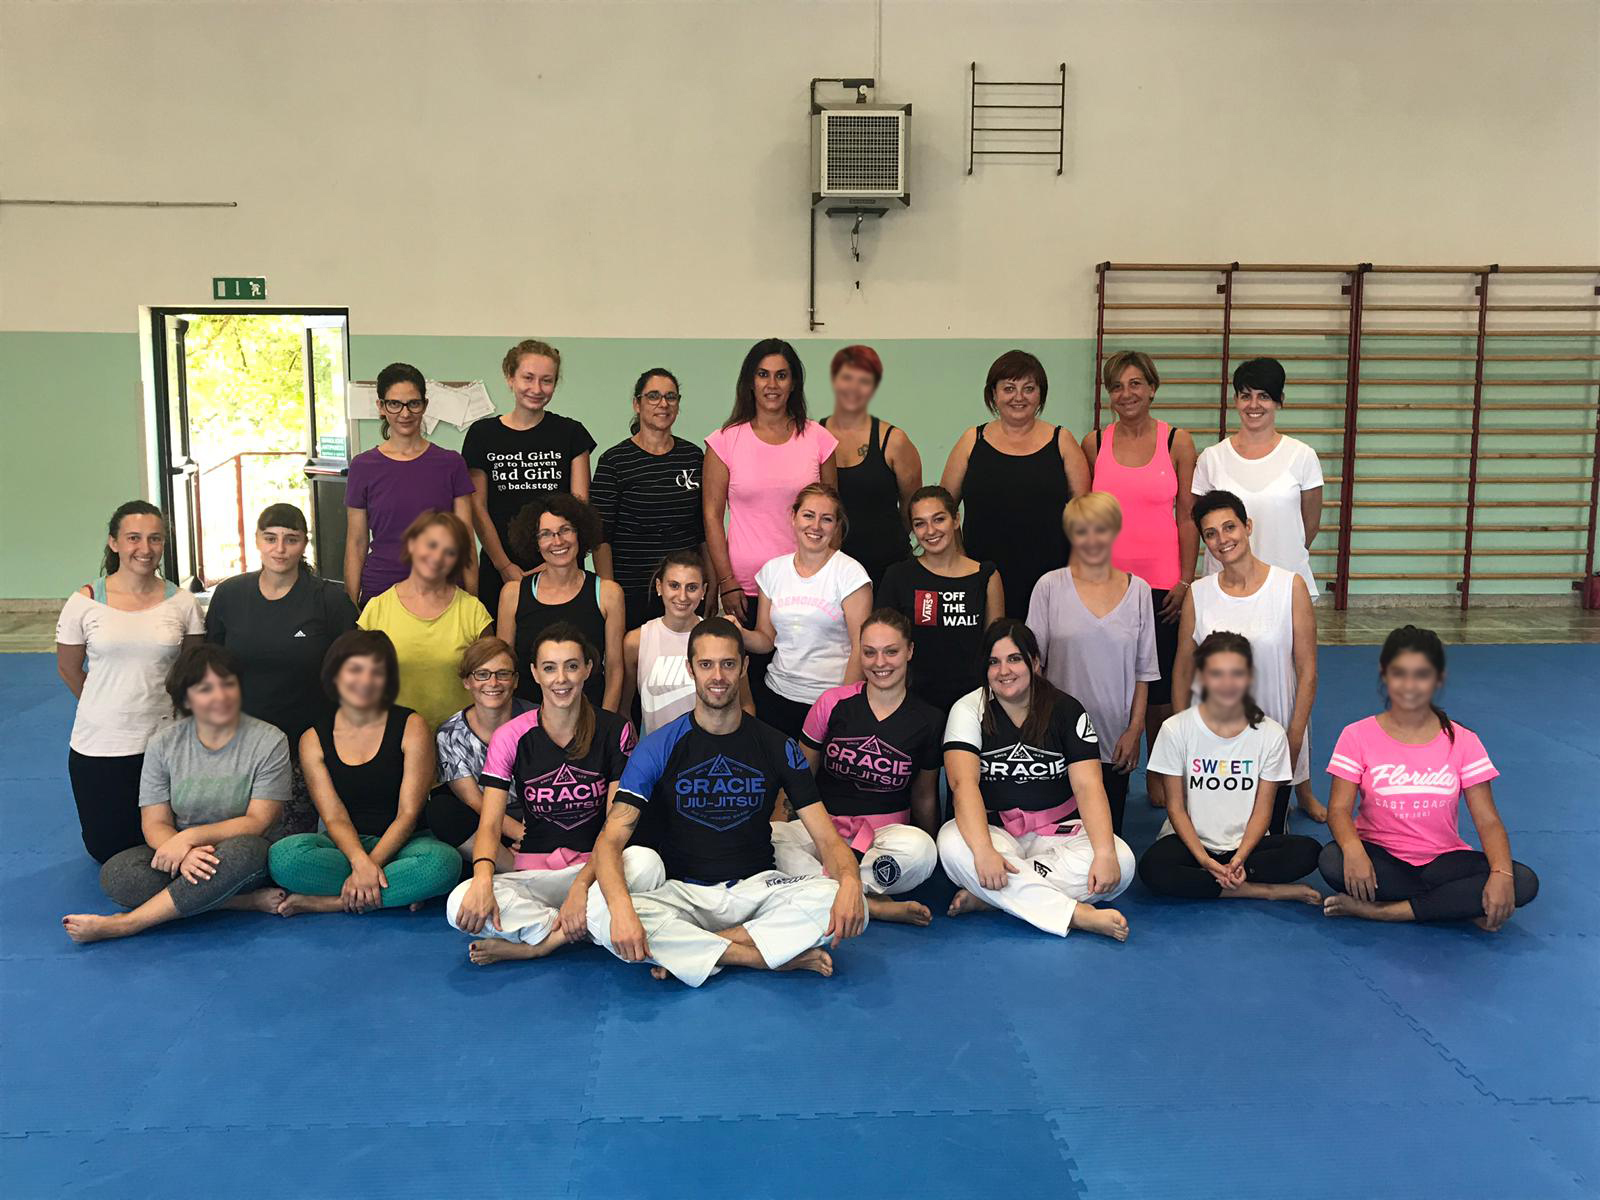 Difesa personale femminile Cesena, seminario women empowered 09/18